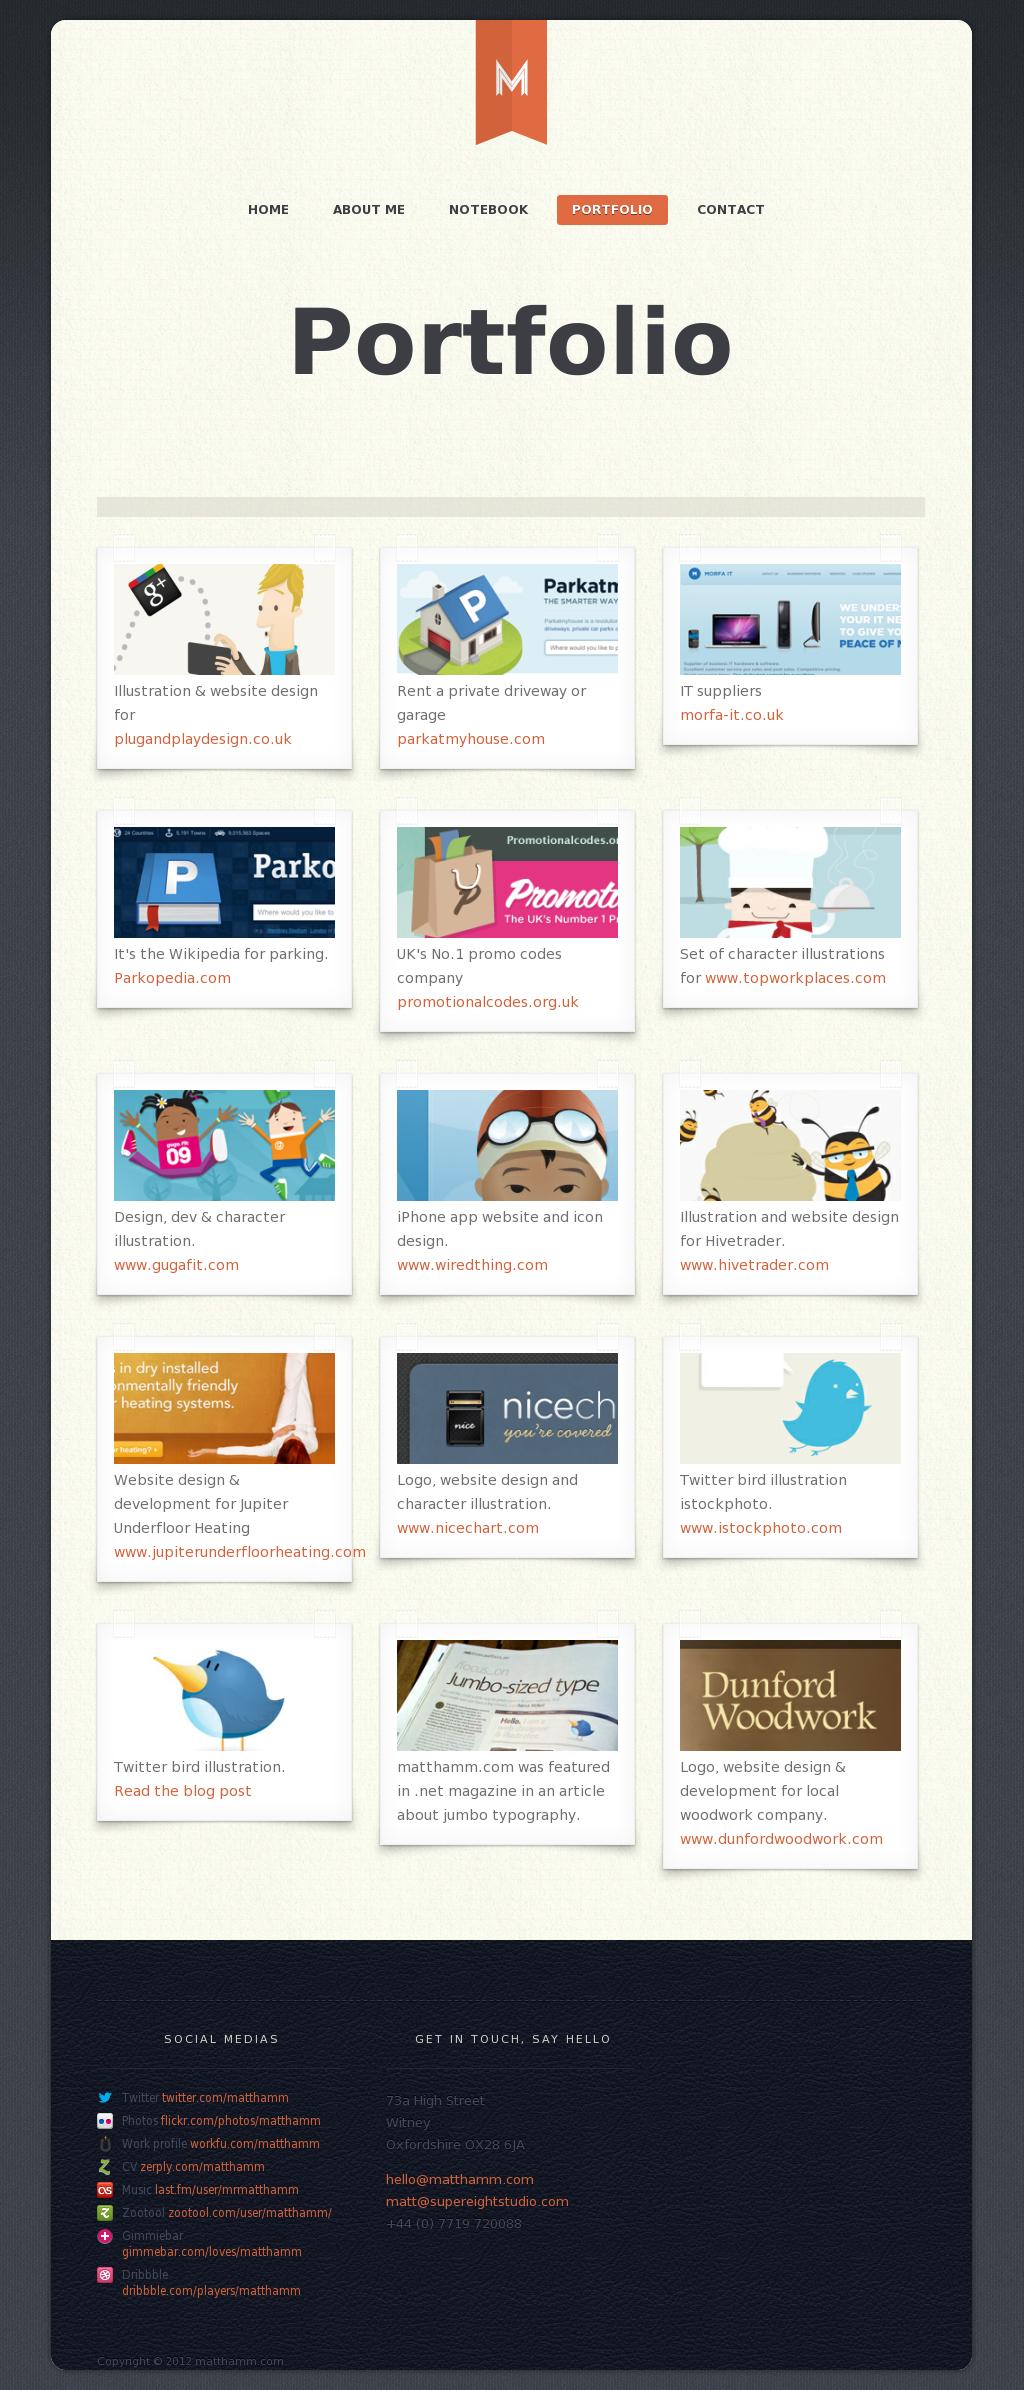 Portfolio | UX/UI Design Inspiration | Pinterest